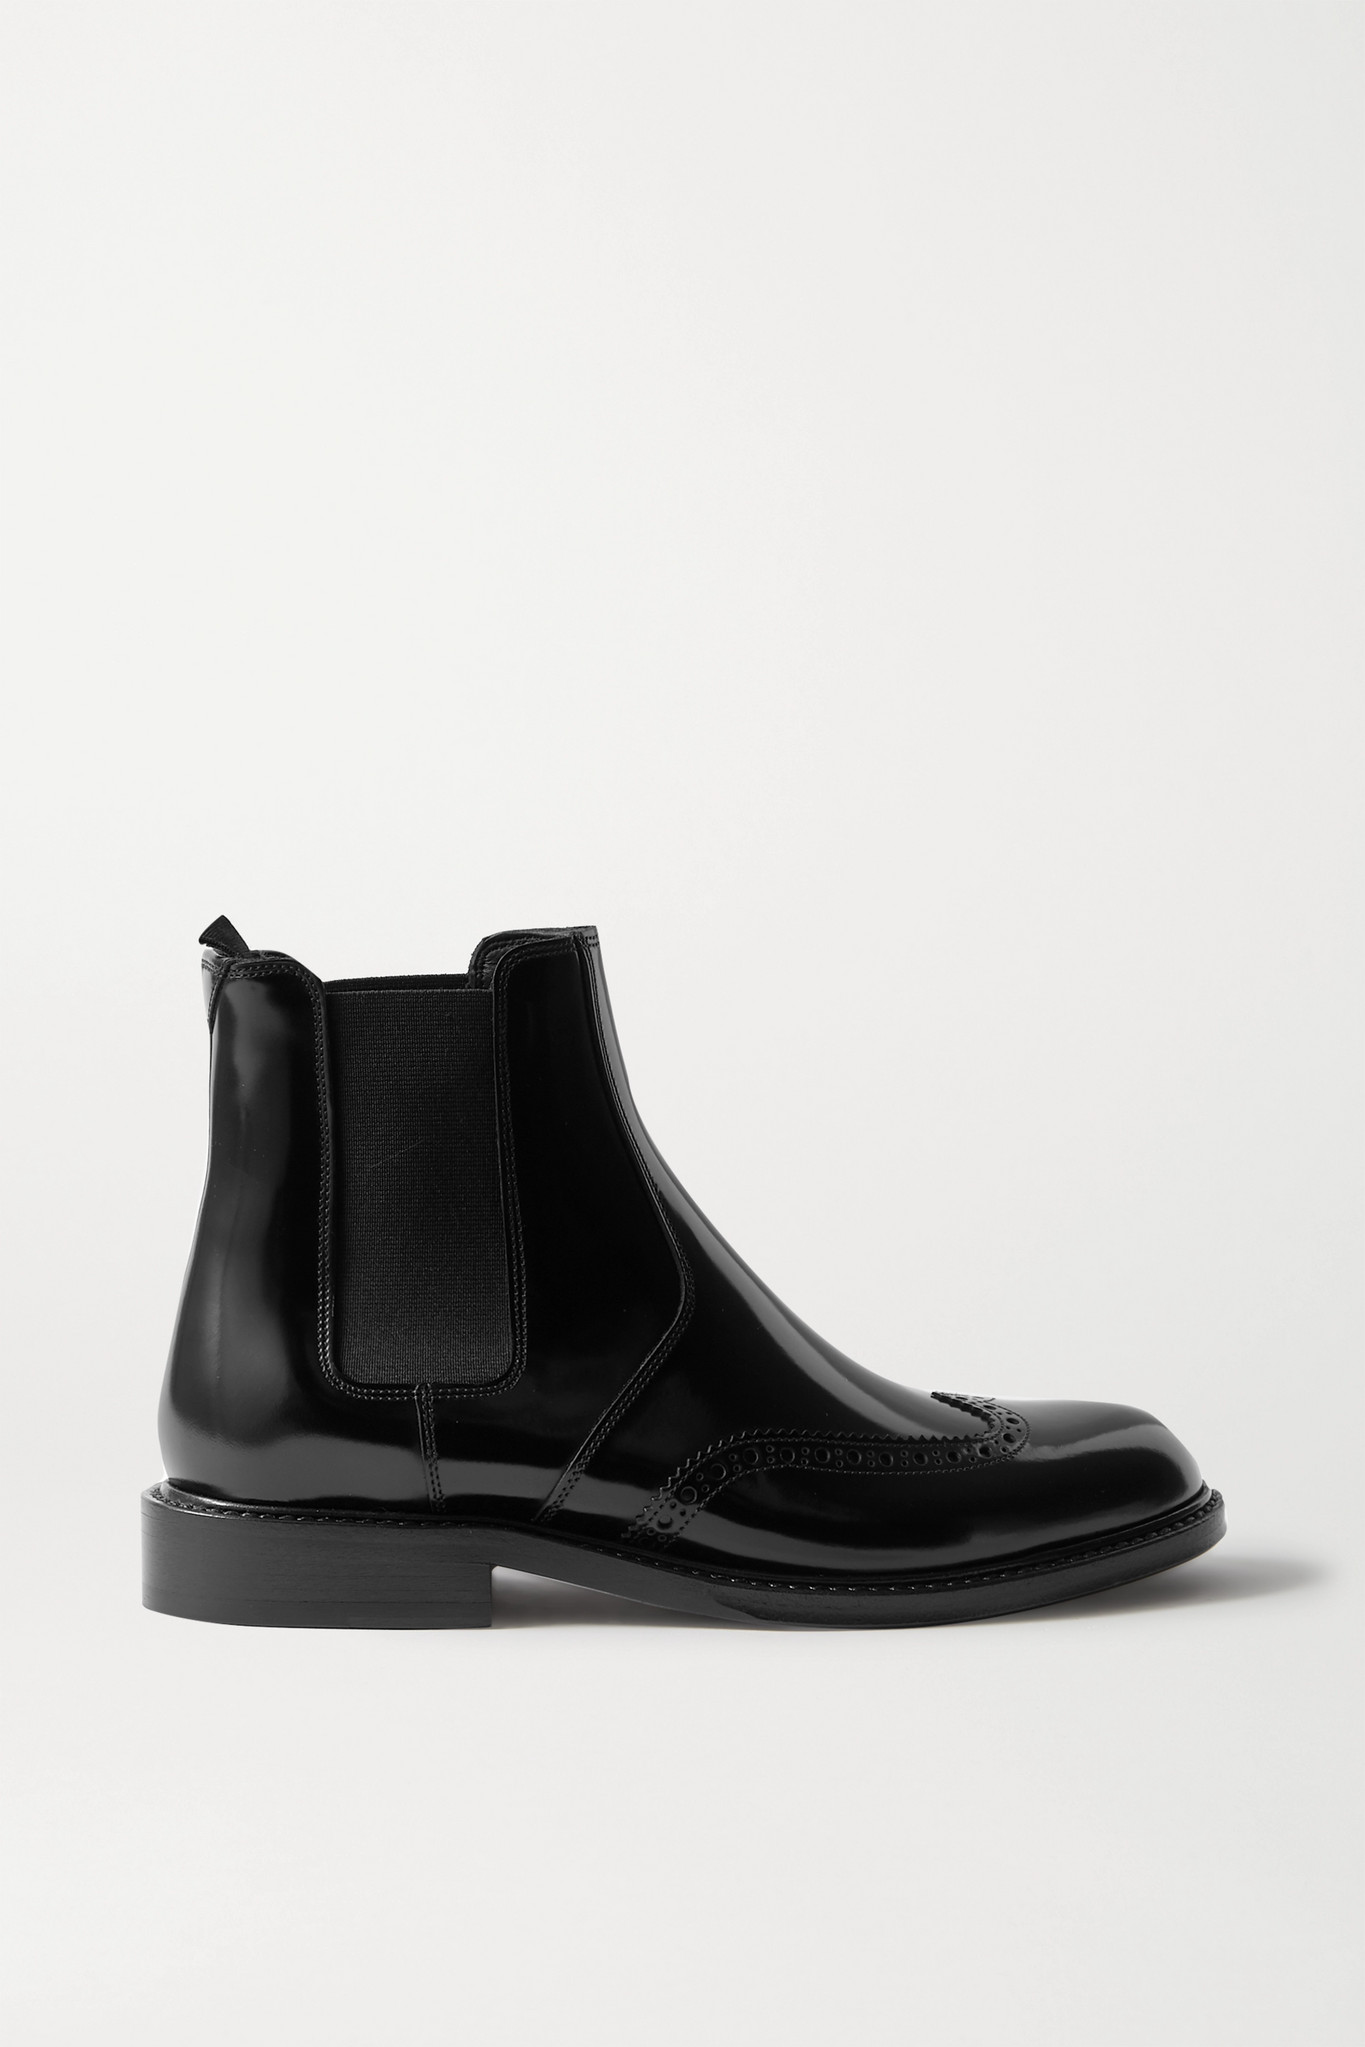 SAINT LAURENT - Ceril 亮面皮革切尔西靴 - 黑色 - IT39.5